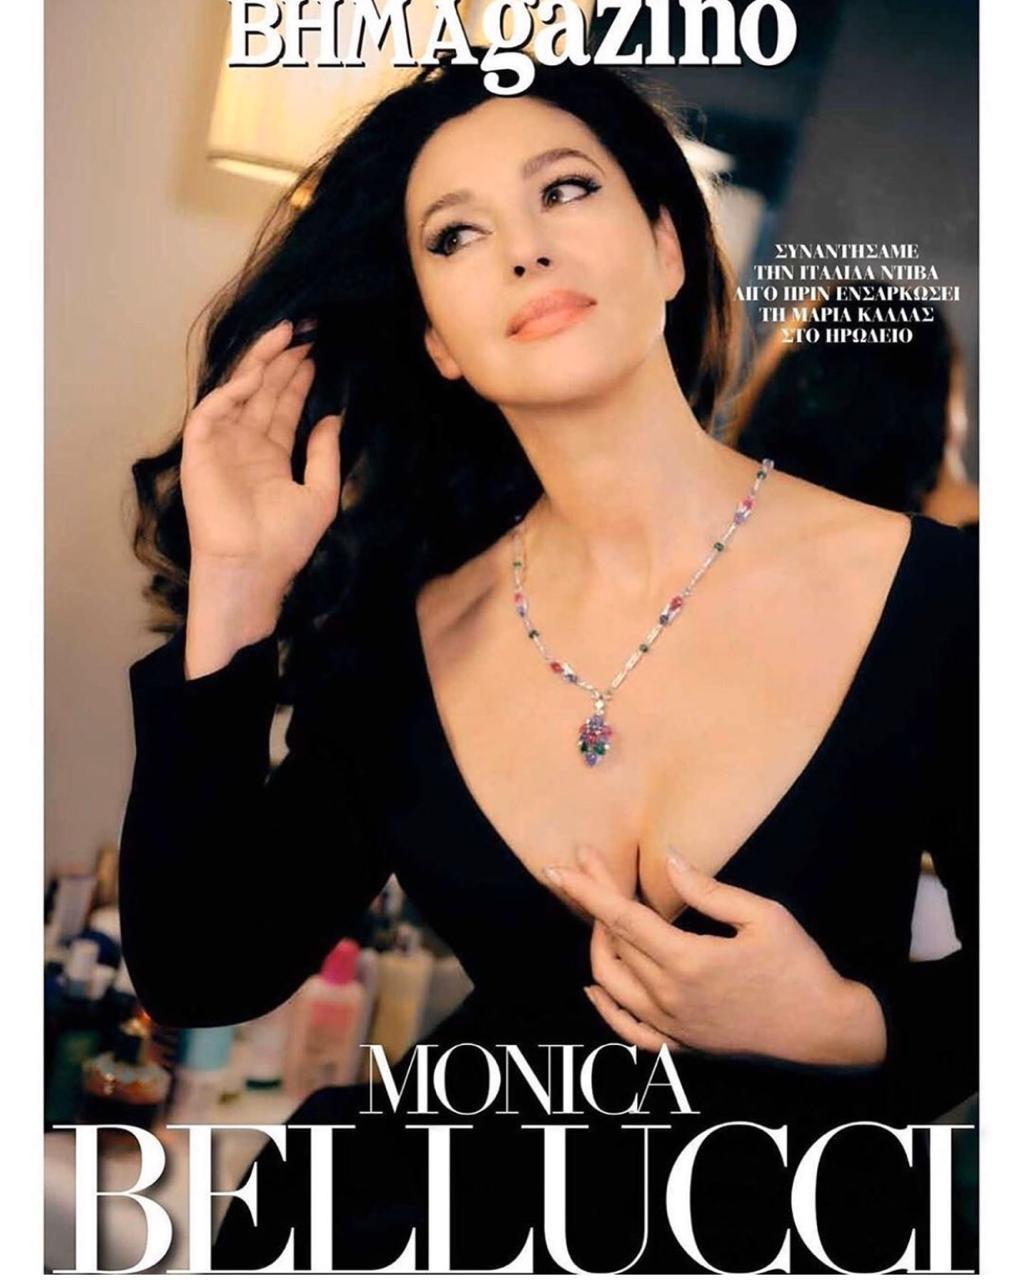 مونيكا بيلوتشي (3)